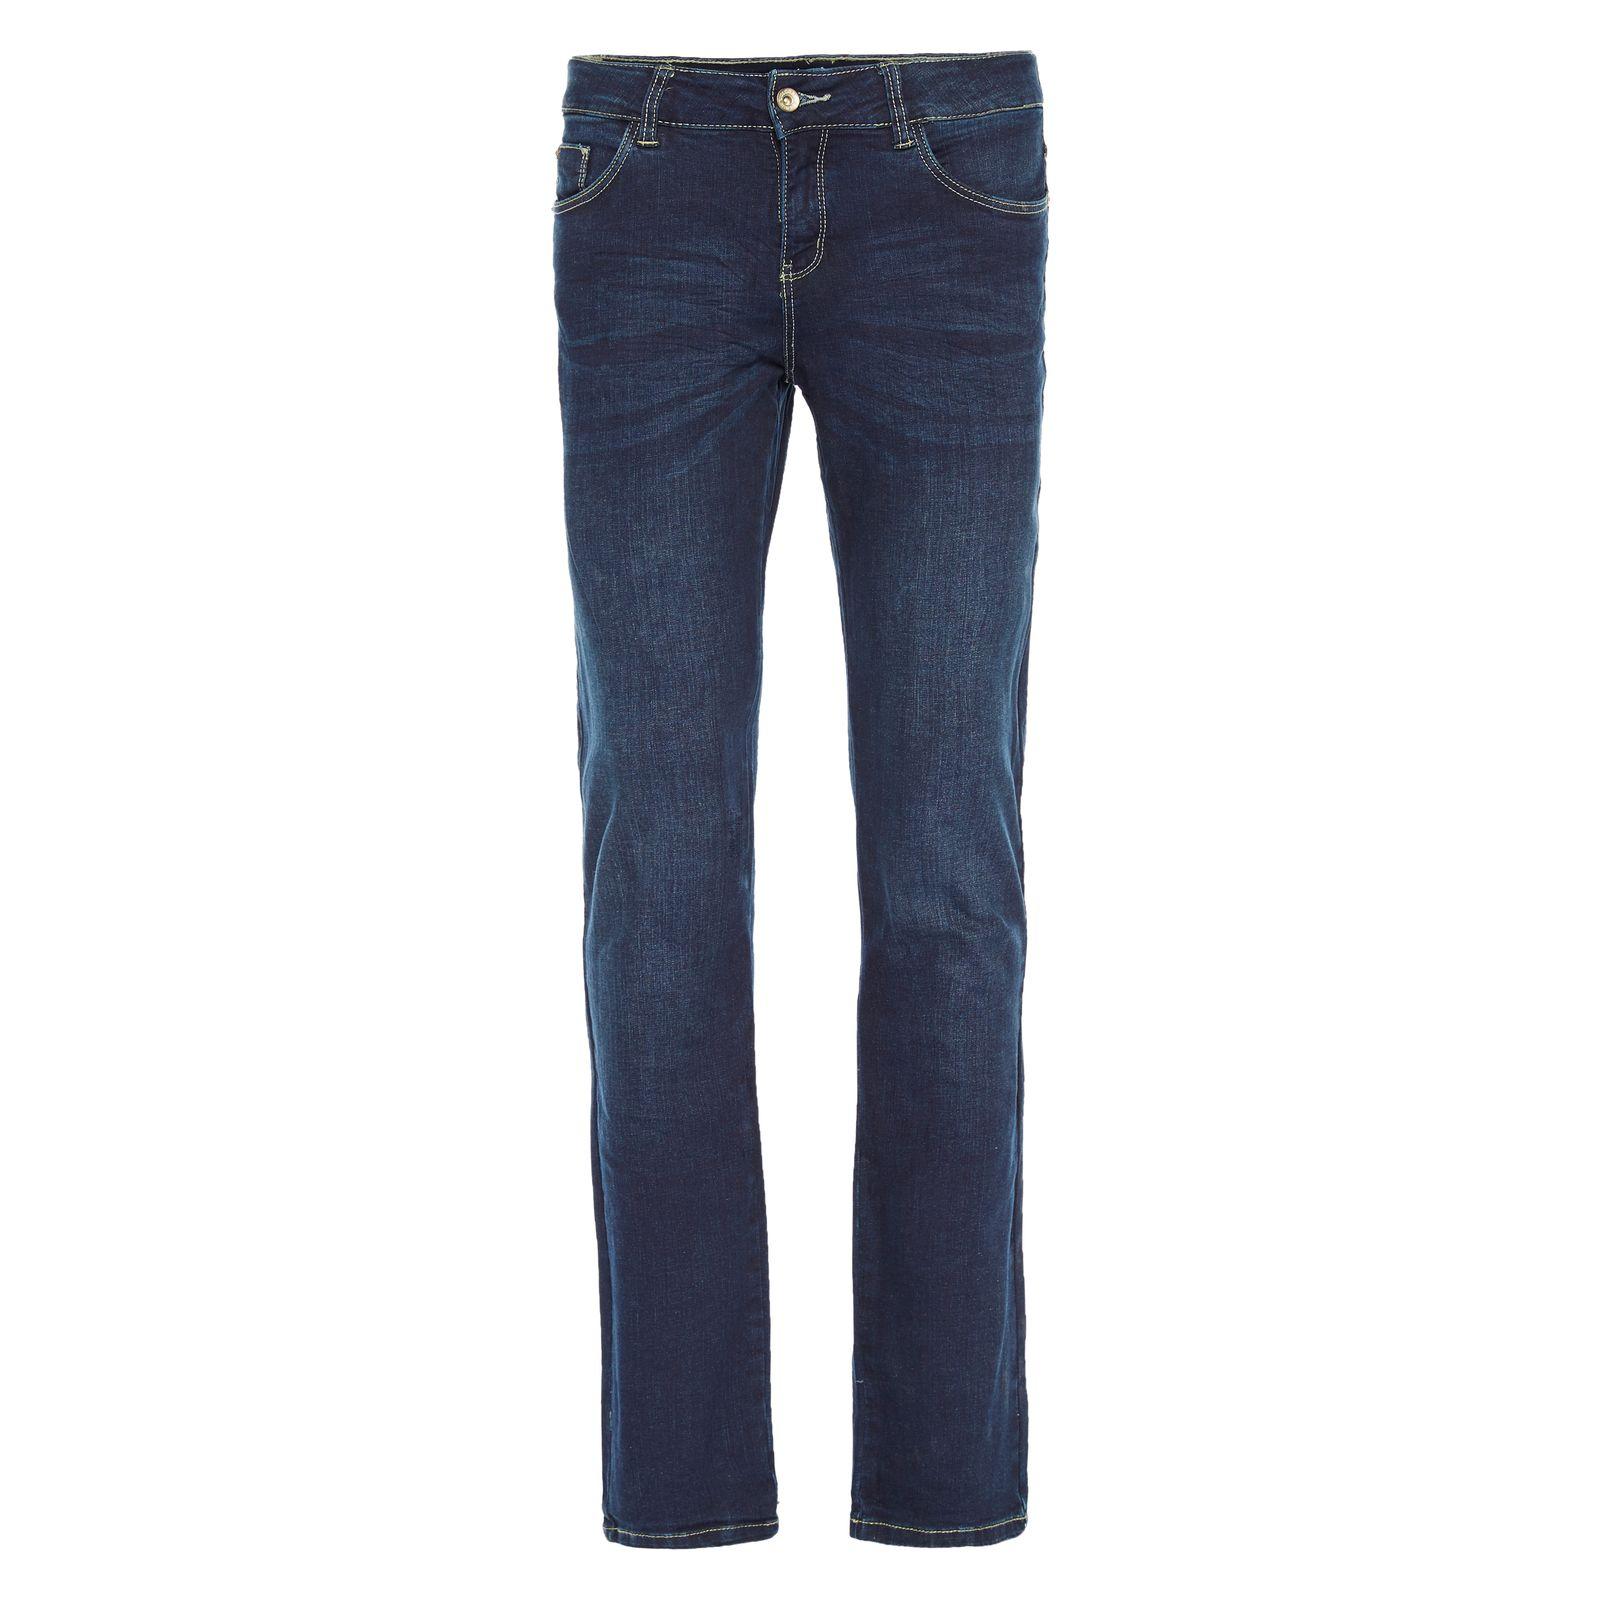 COLORADO DENIM Jeans Layla für Damen